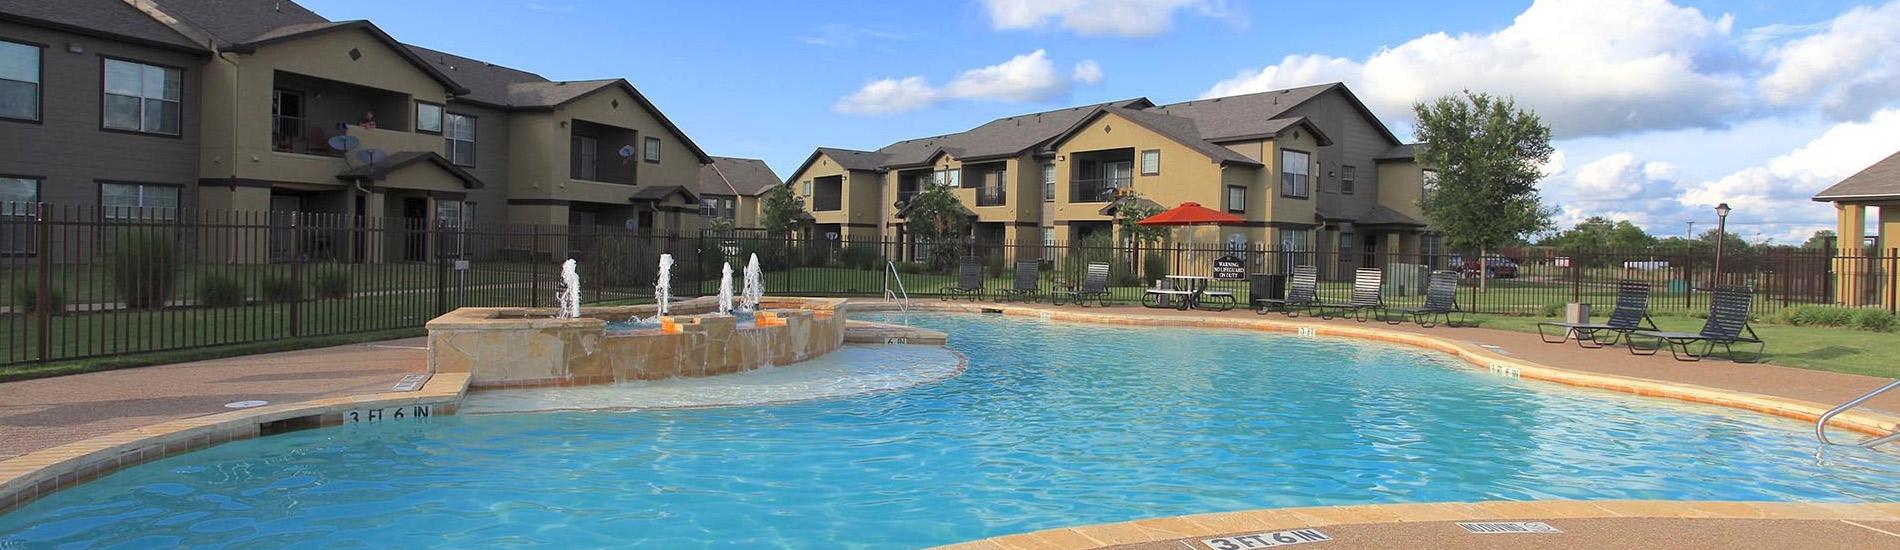 Superb Apartments In Kemp Tx The Hamlins At Cedar Creek Lake In Home Interior And Landscaping Analalmasignezvosmurscom